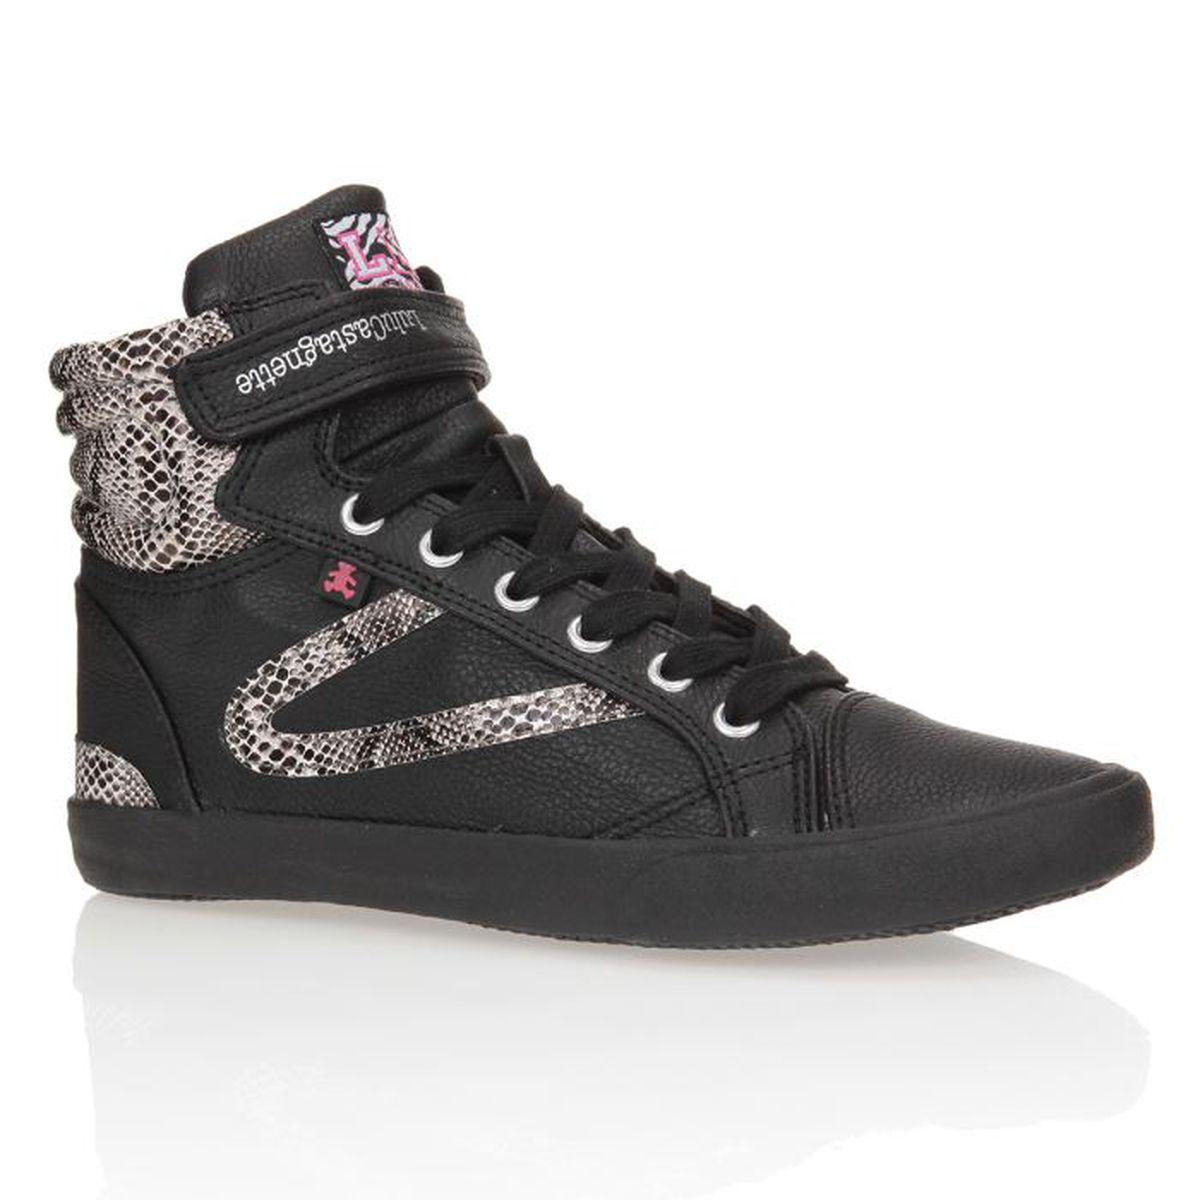 lulu castagnette baskets montantes chaussures femme femme noir et gris achat vente lulu. Black Bedroom Furniture Sets. Home Design Ideas